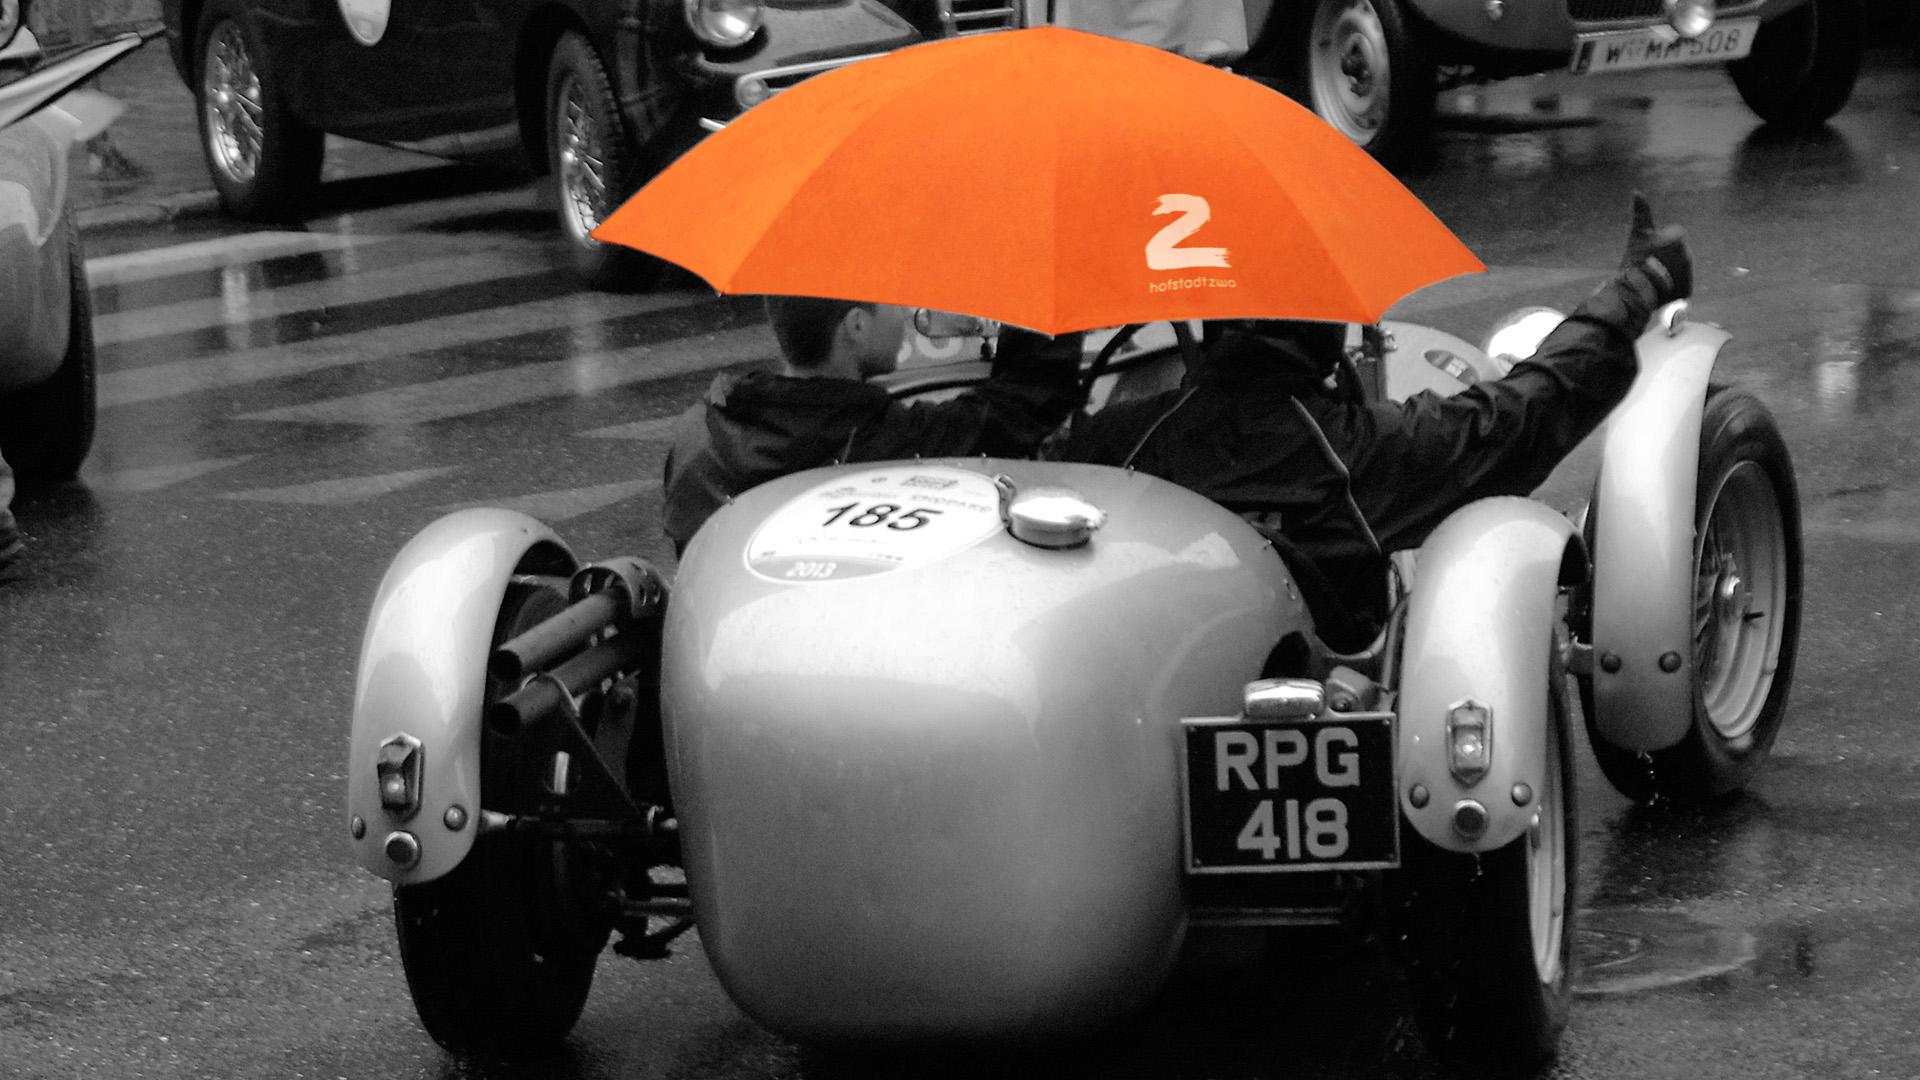 Anfahrt_h2_sw_orange